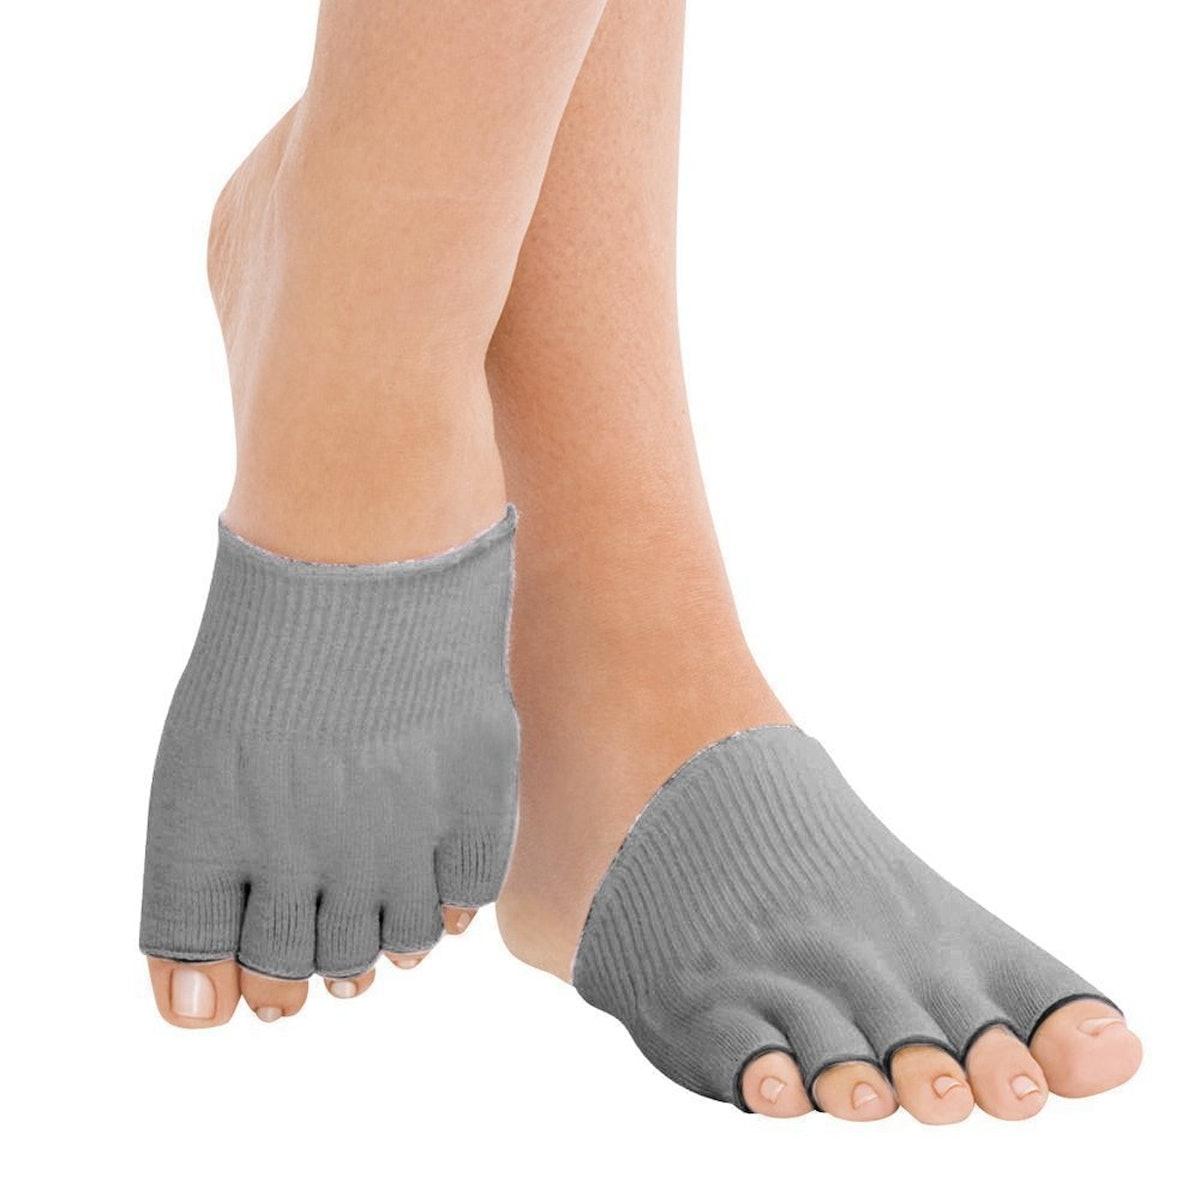 Bcurb Gel Lined Compression Toe Socks